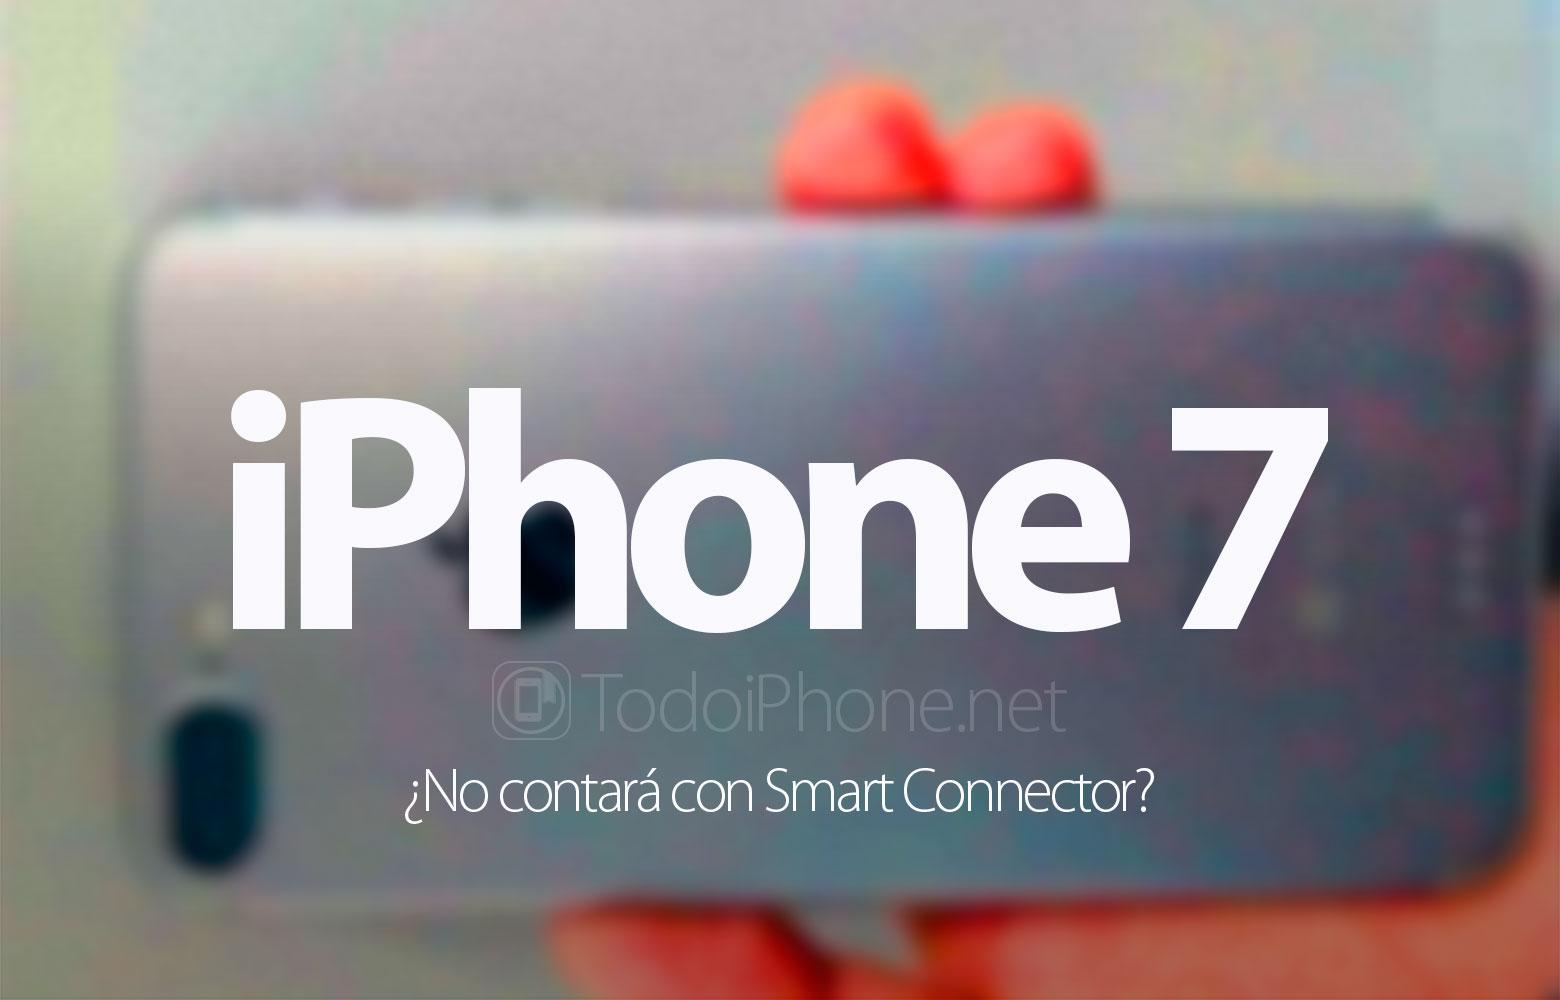 iphone-7-no-contara-smart-connector